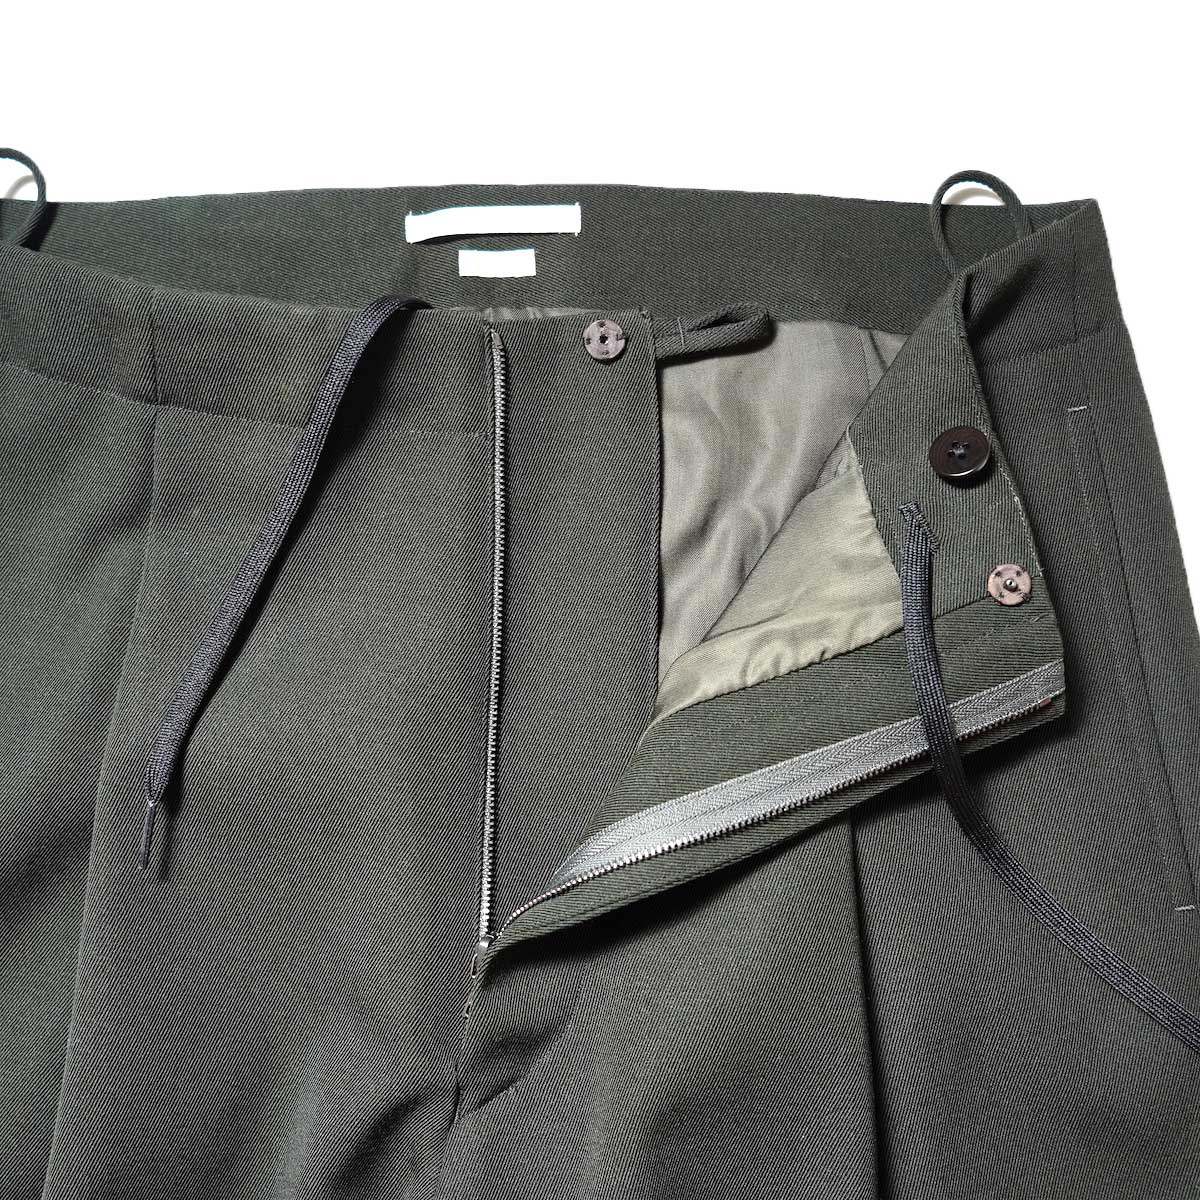 Blurhms / Wool Surge Super Wide Easy Slacks (Khaki Grey)ジップ